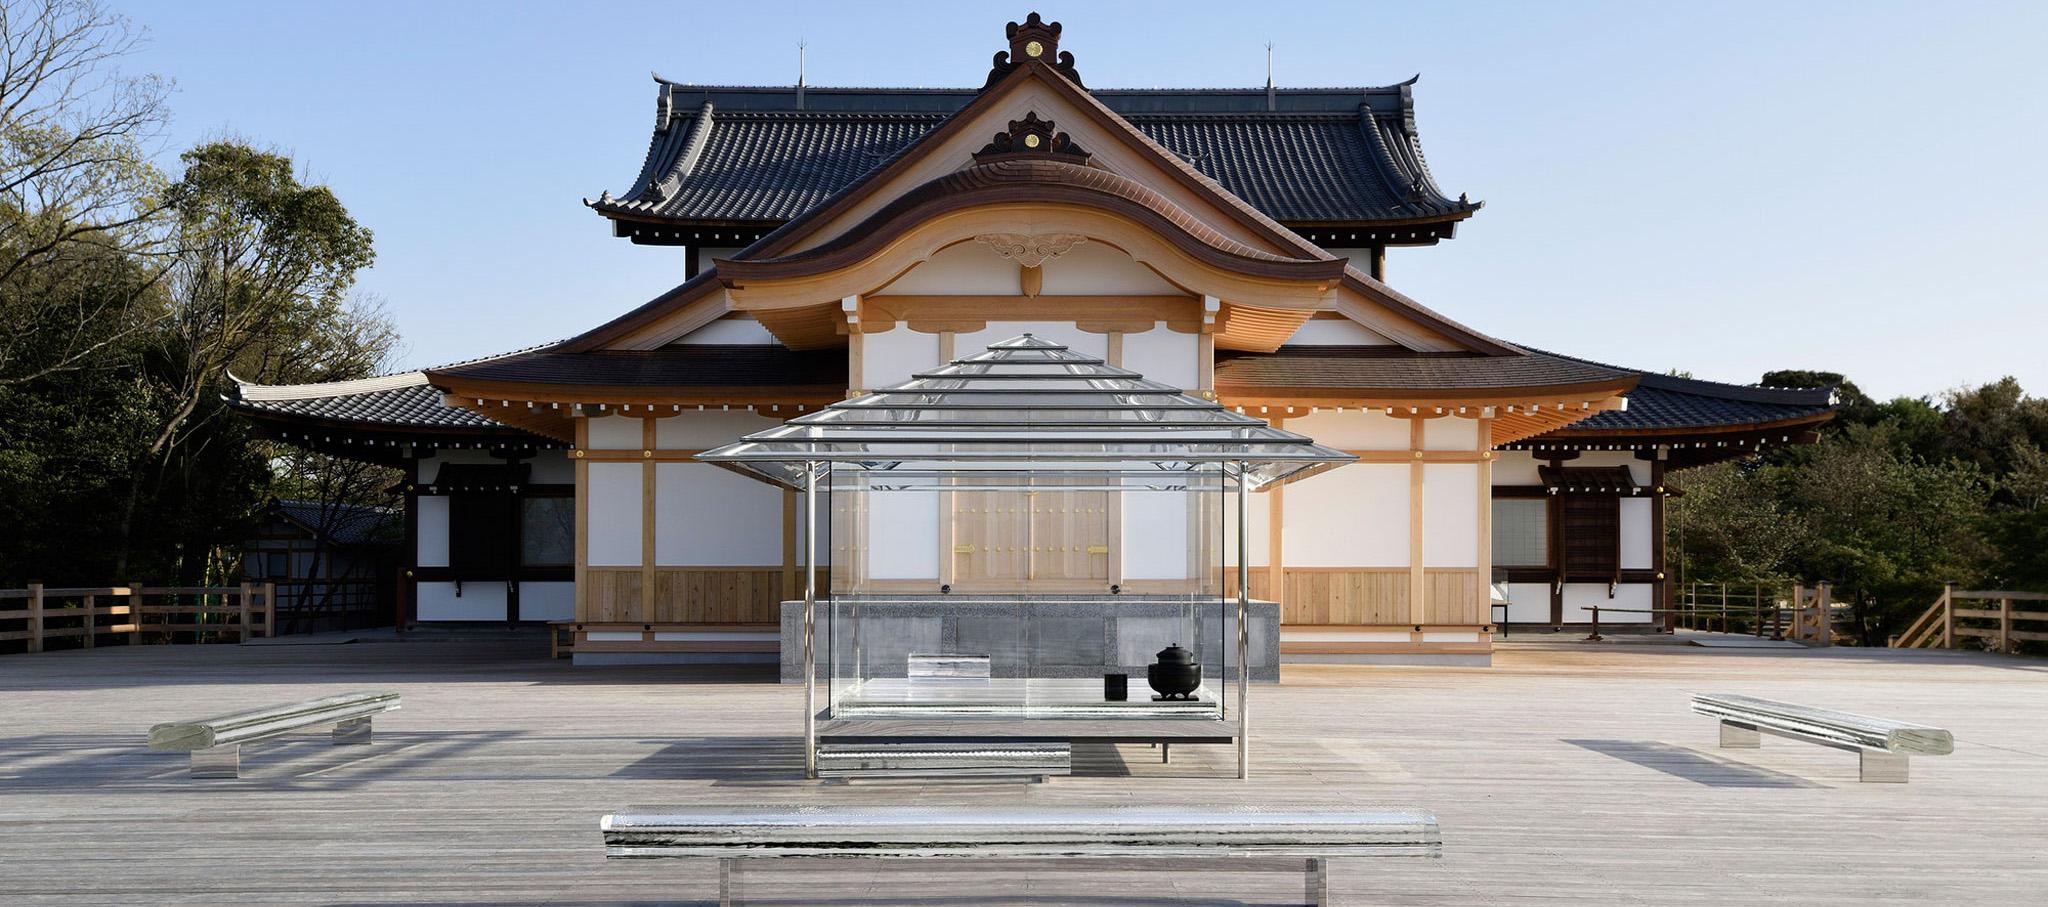 KOU-AN una casa del té en vidrio por Tokujin Yoshioka. Fotografía © Yasutake Kondo